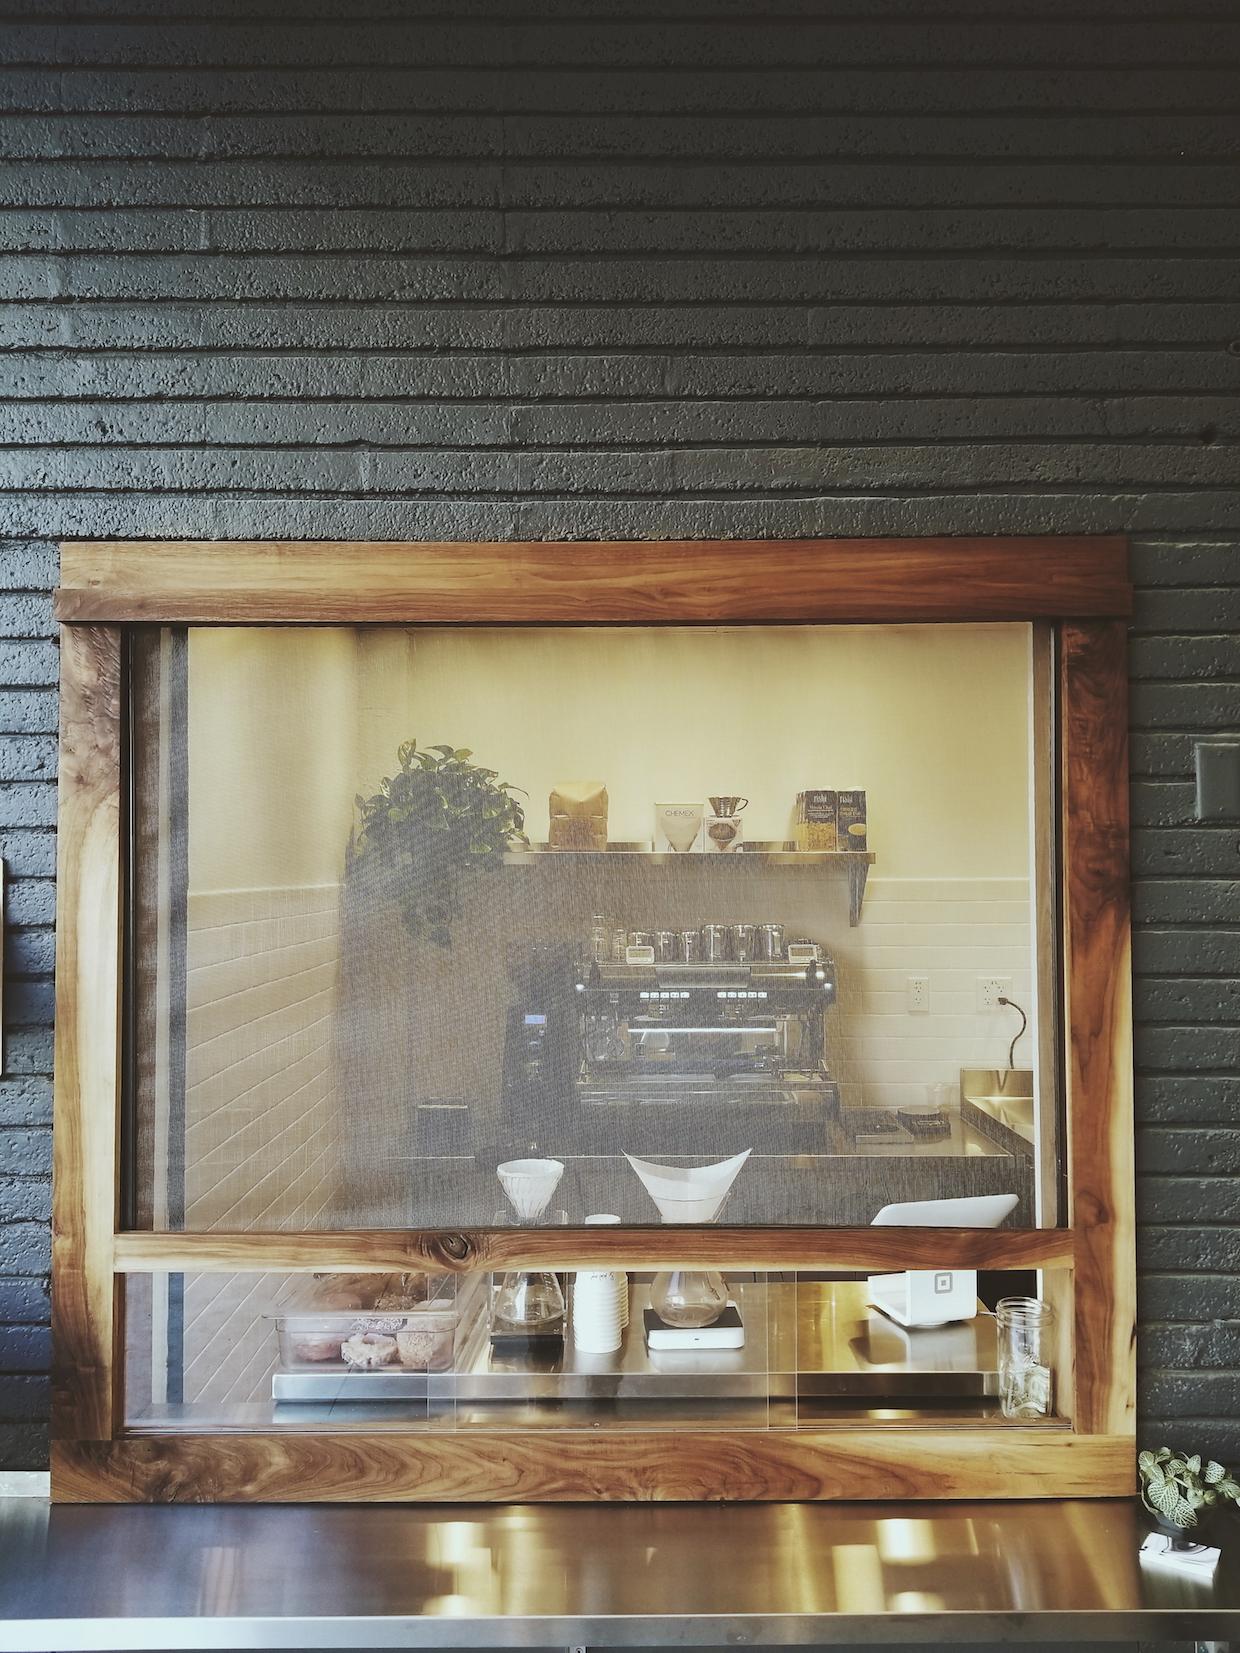 Slojoy coffee roasters bar oakland california